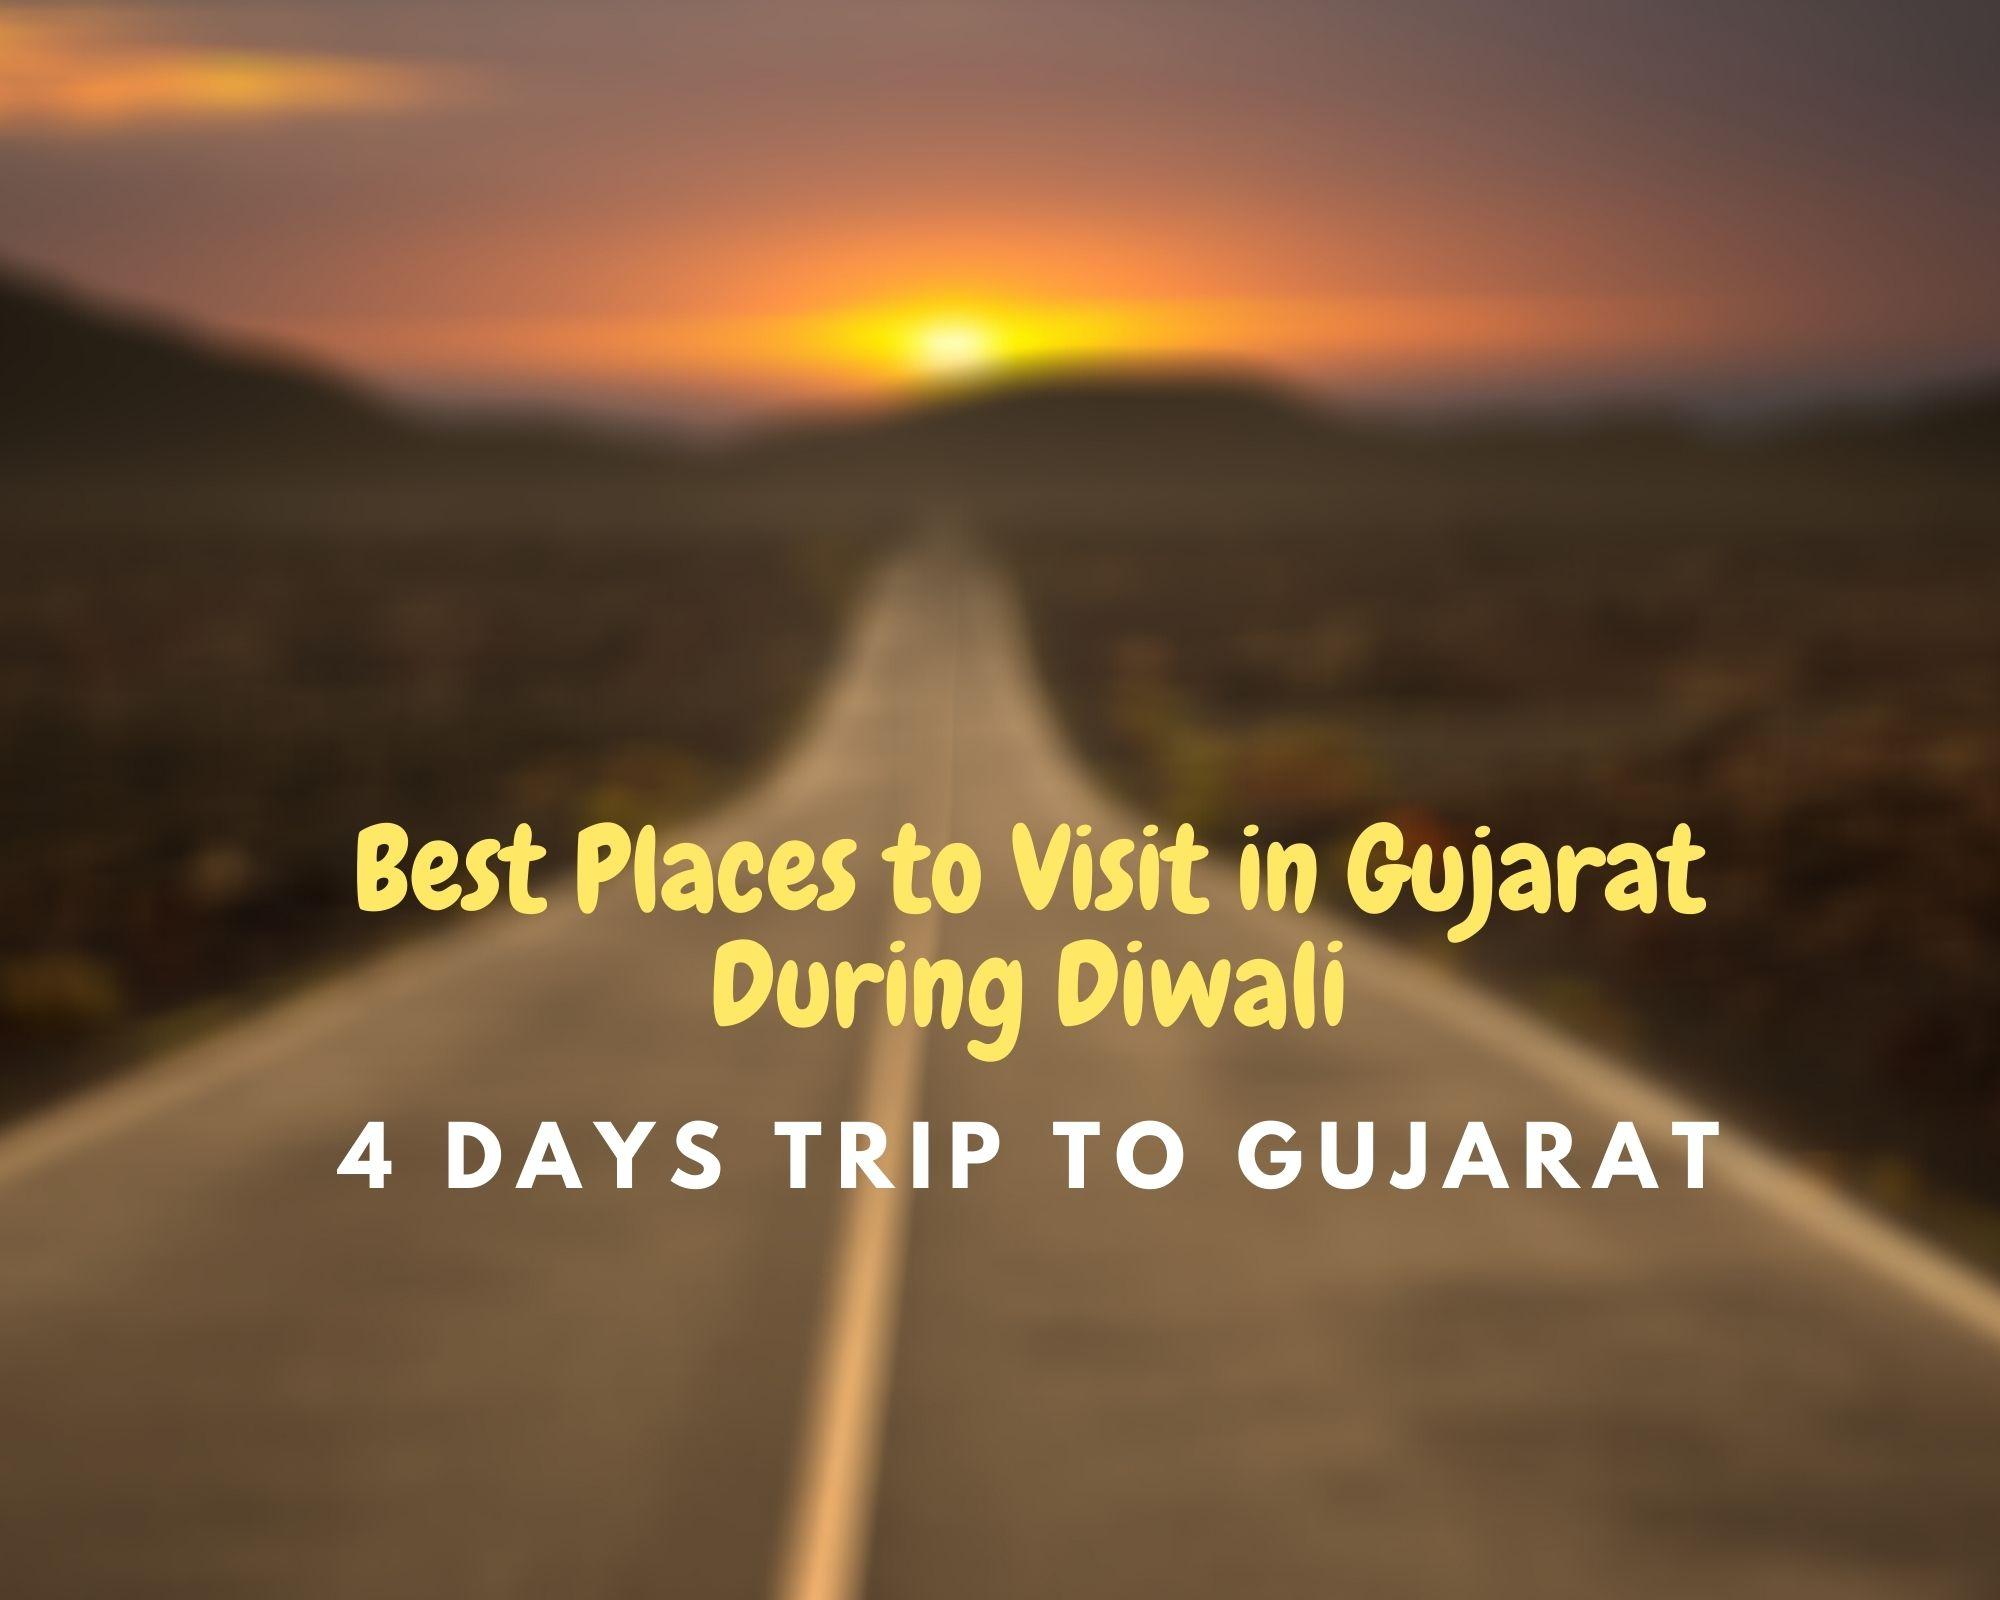 Best Places to Visit in Gujarat During Diwali | 4 days trip to Gujarat